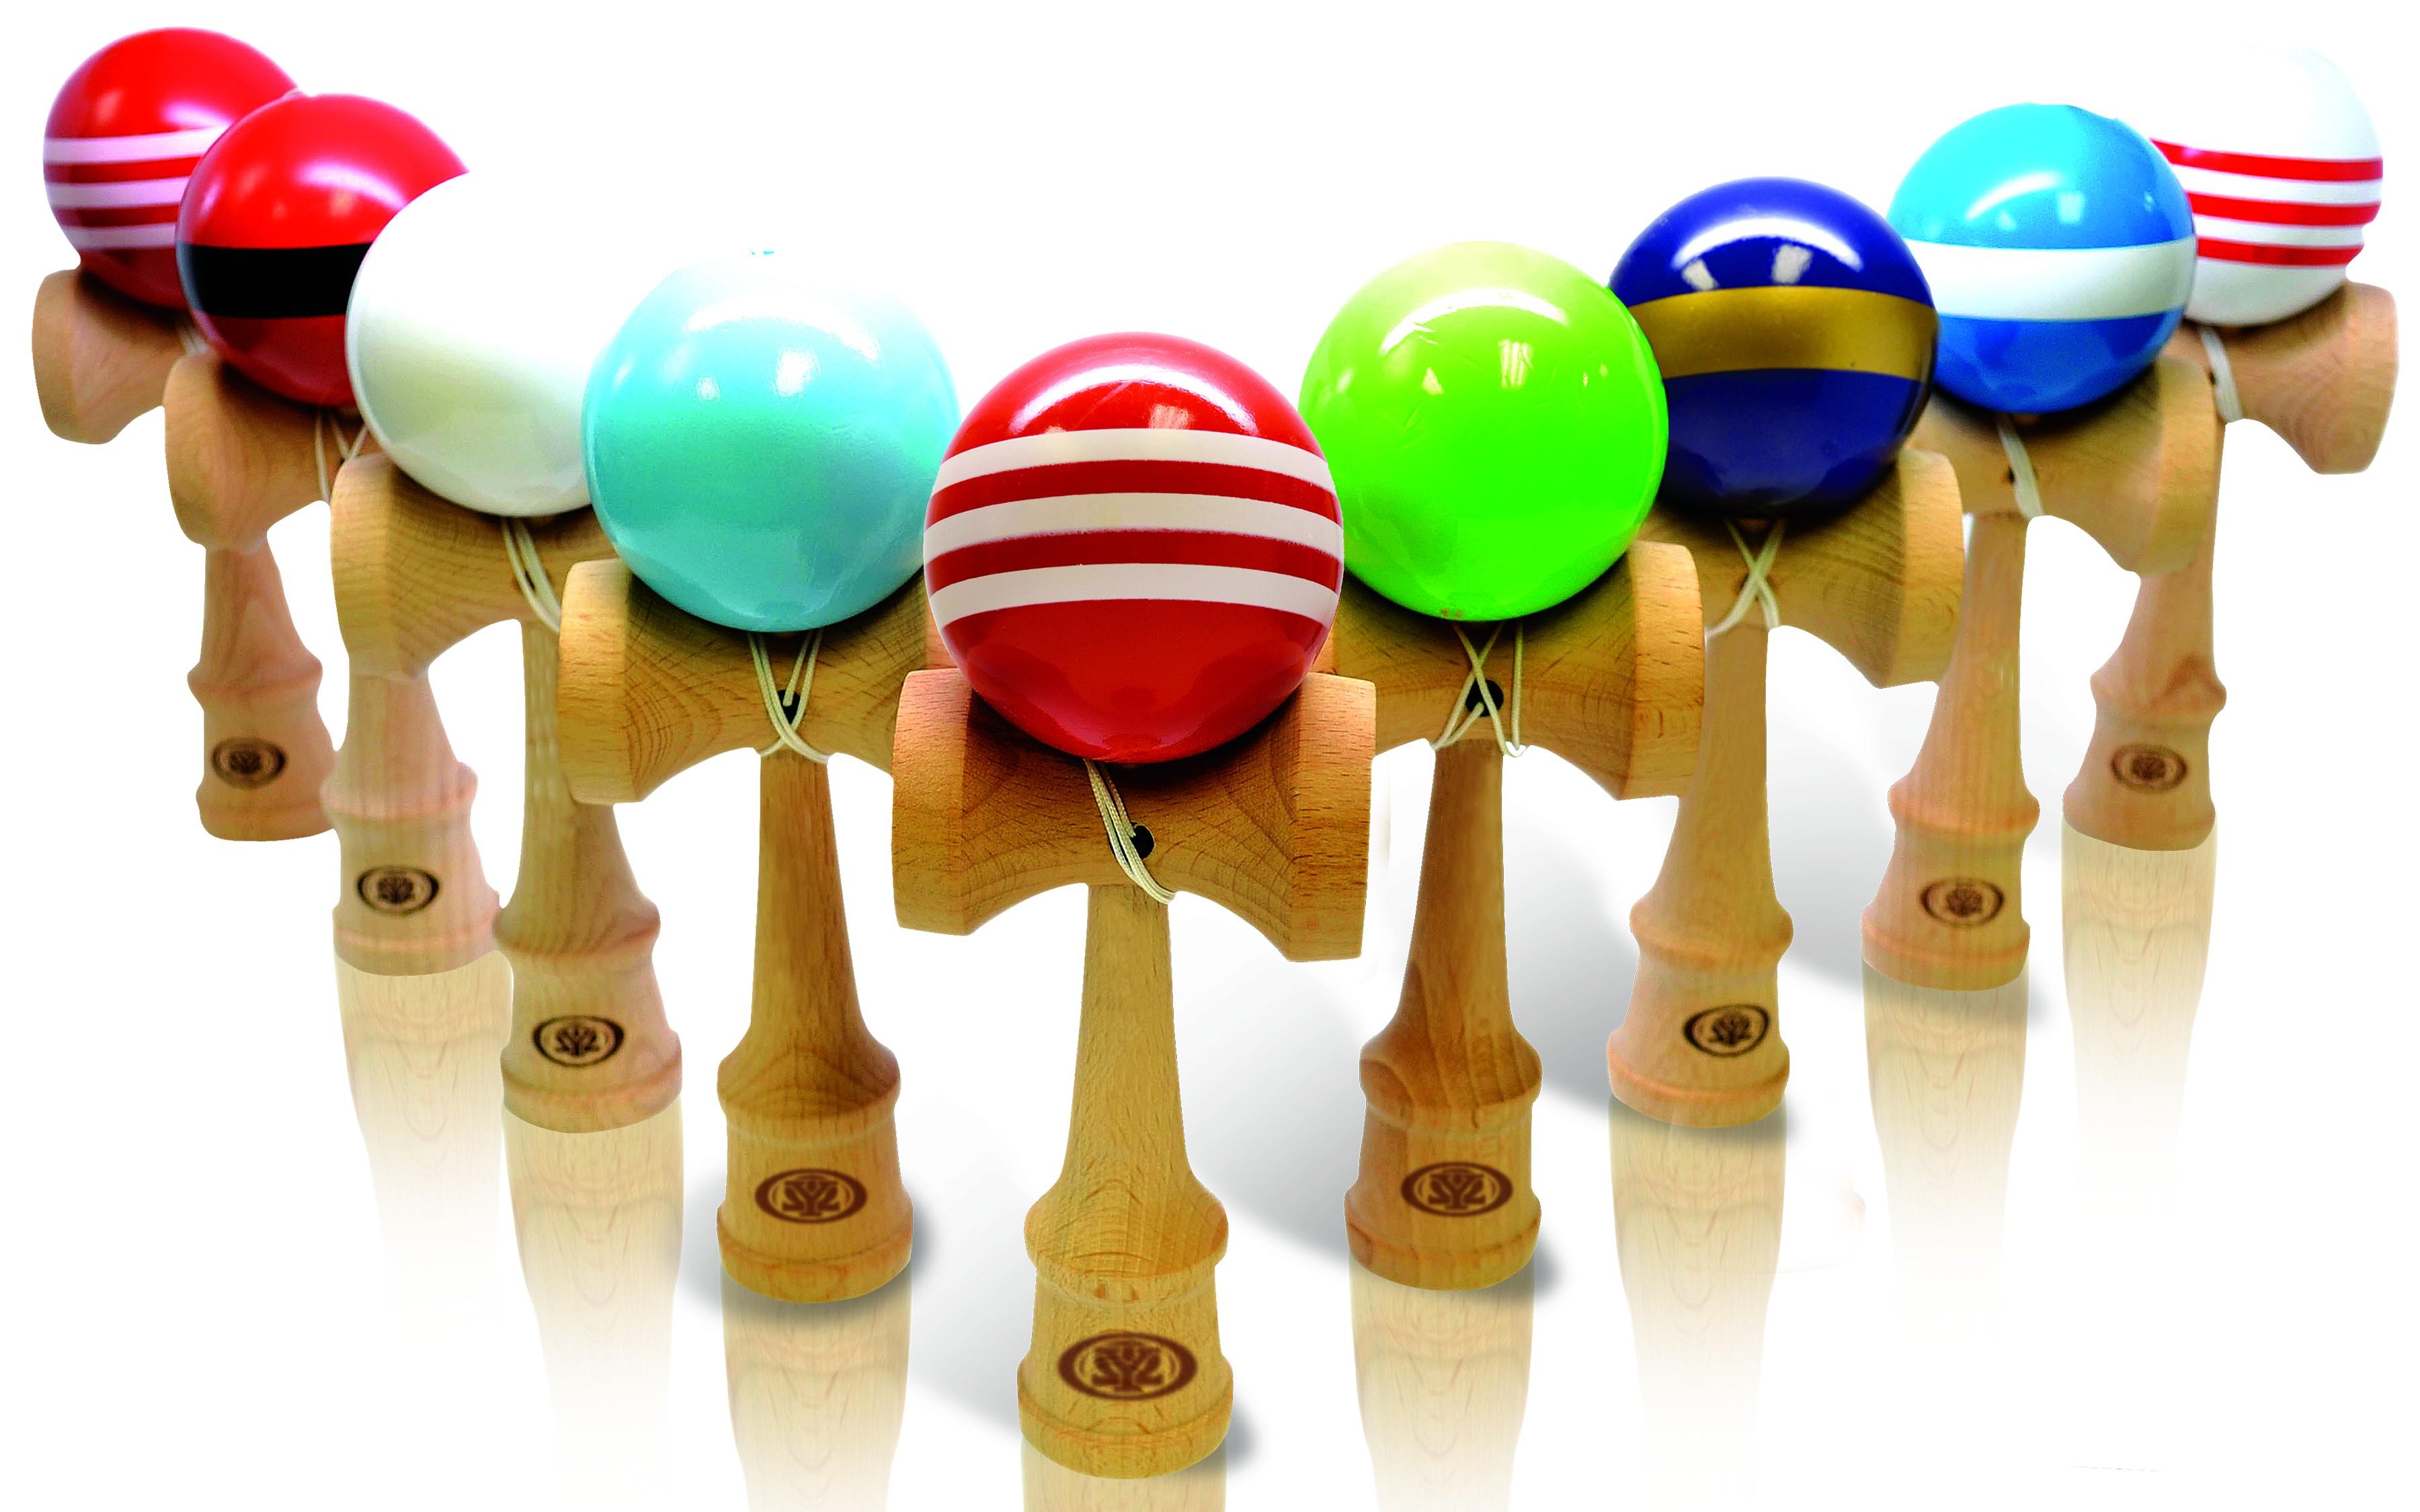 Japan Traditional Toys : Must have japanese souvenirs kendama deepjapan